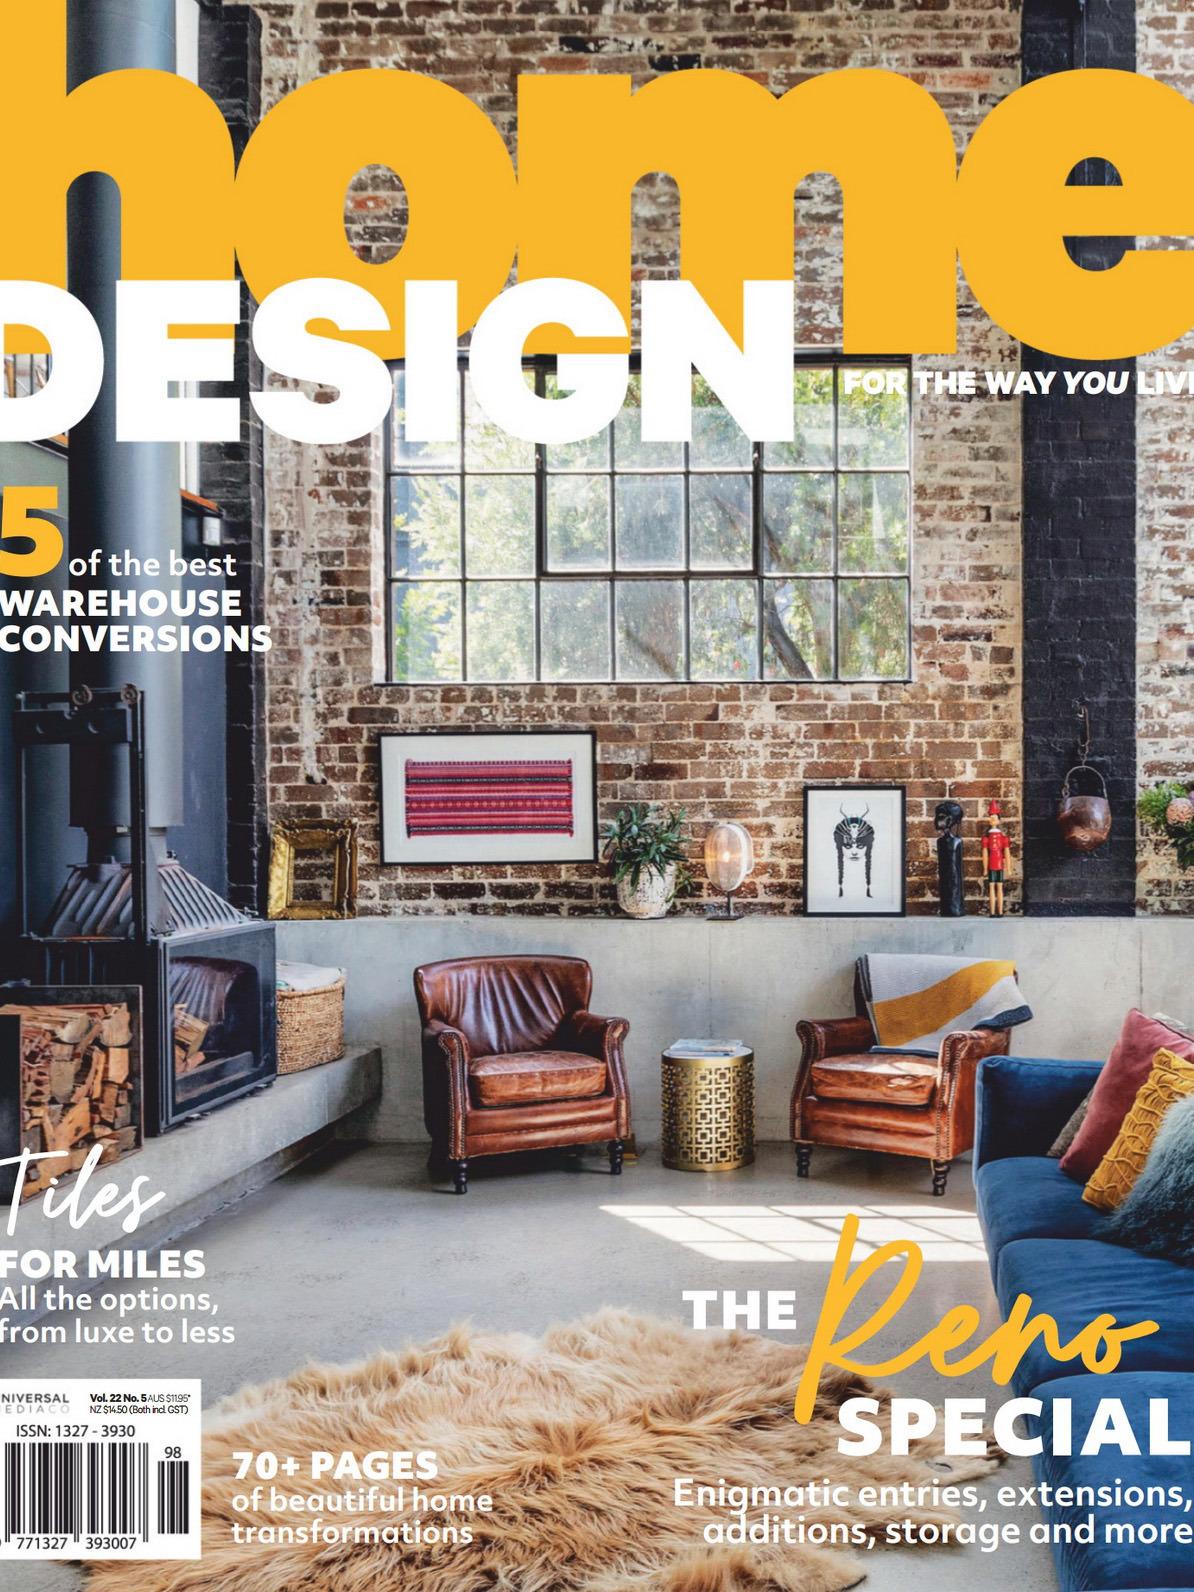 《Luxury Home Design》澳大利亚版时尚家纺杂志2020年05月号(Vol-22.No.5)